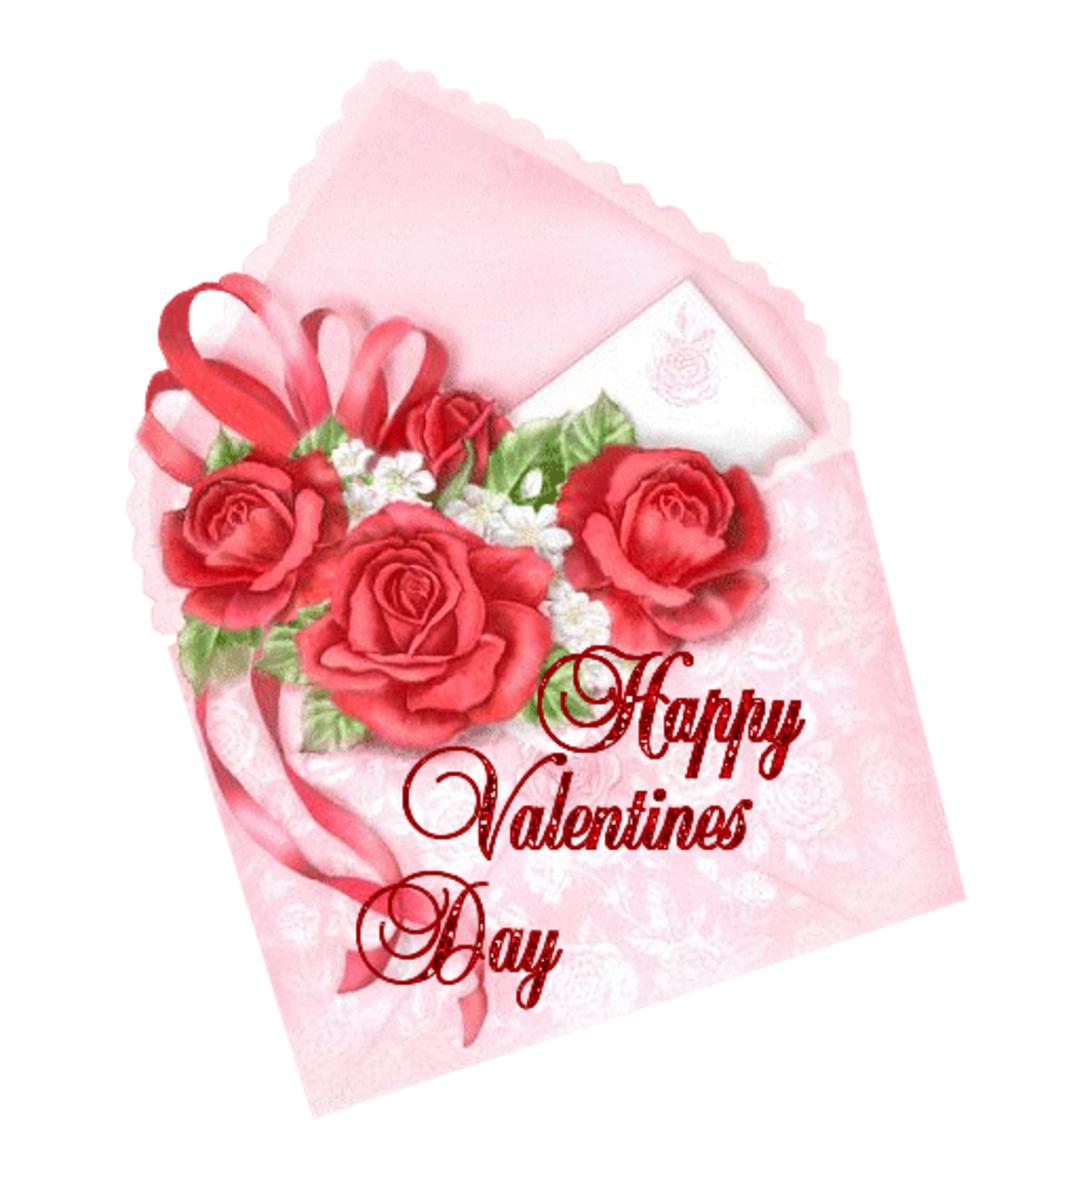 Happy Valentine's Day Greeting in Envelope